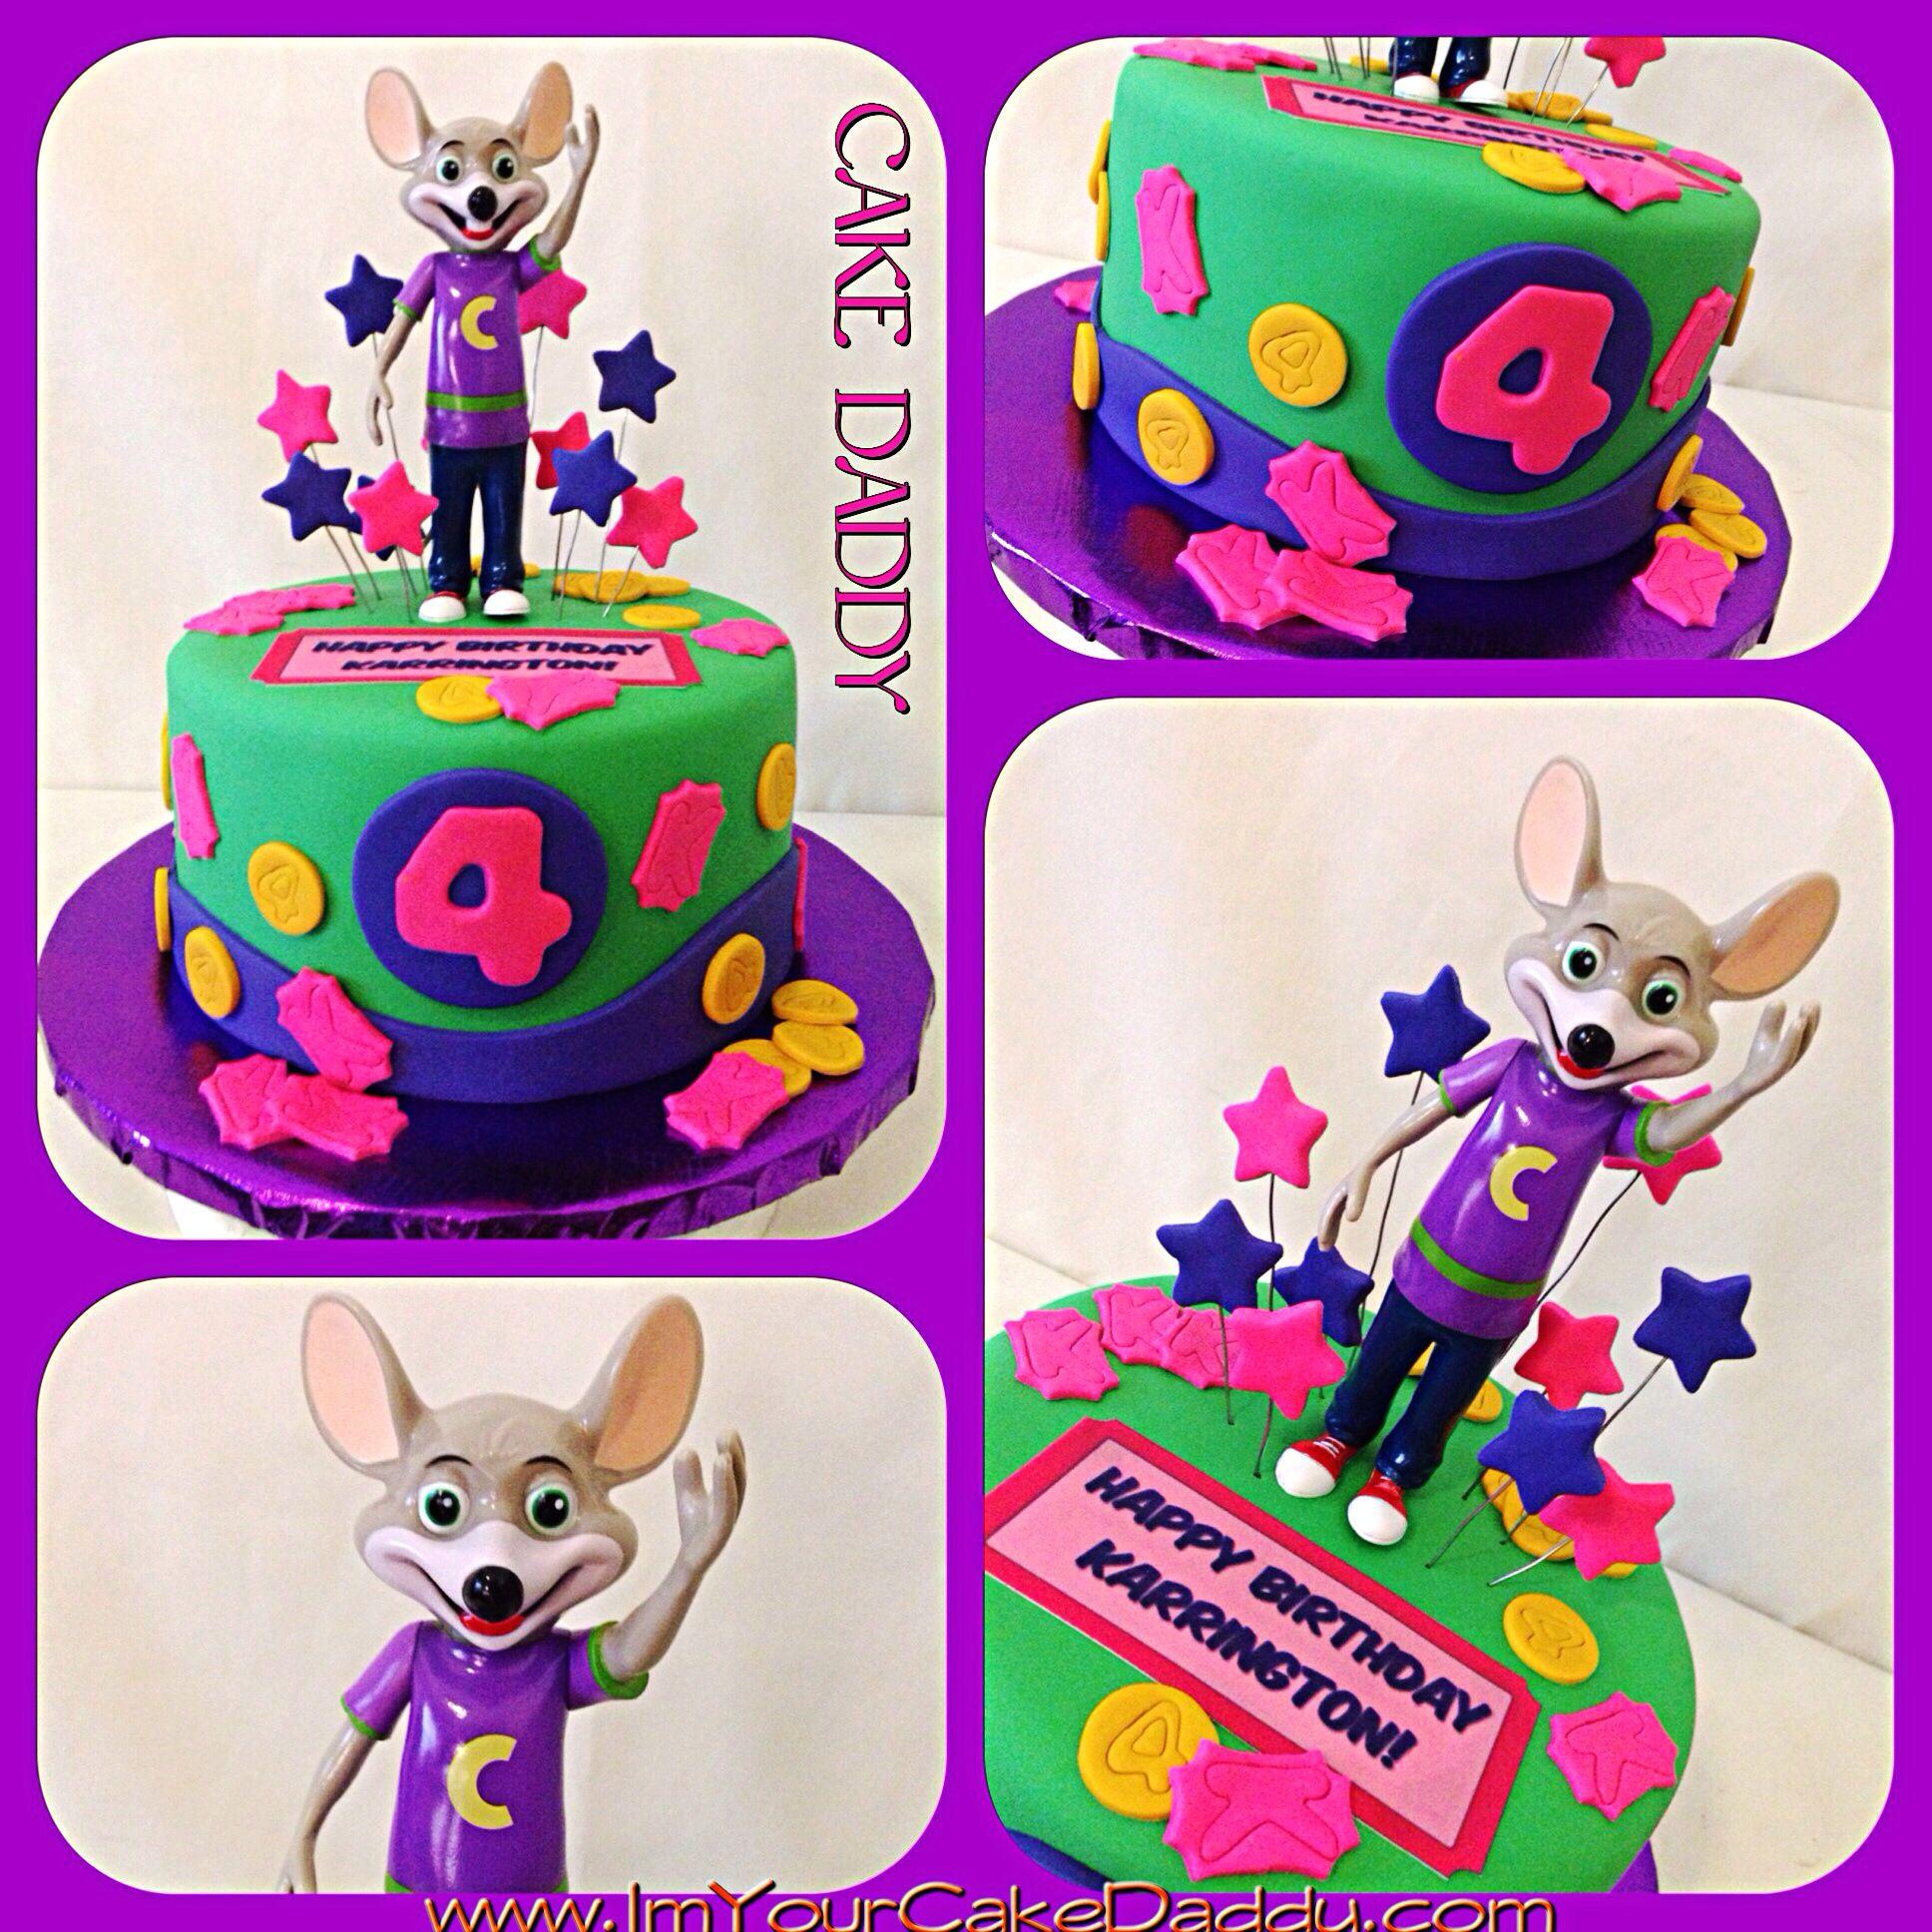 Chuck E Cheese birthday cake Custom Cakes by Cake Daddy